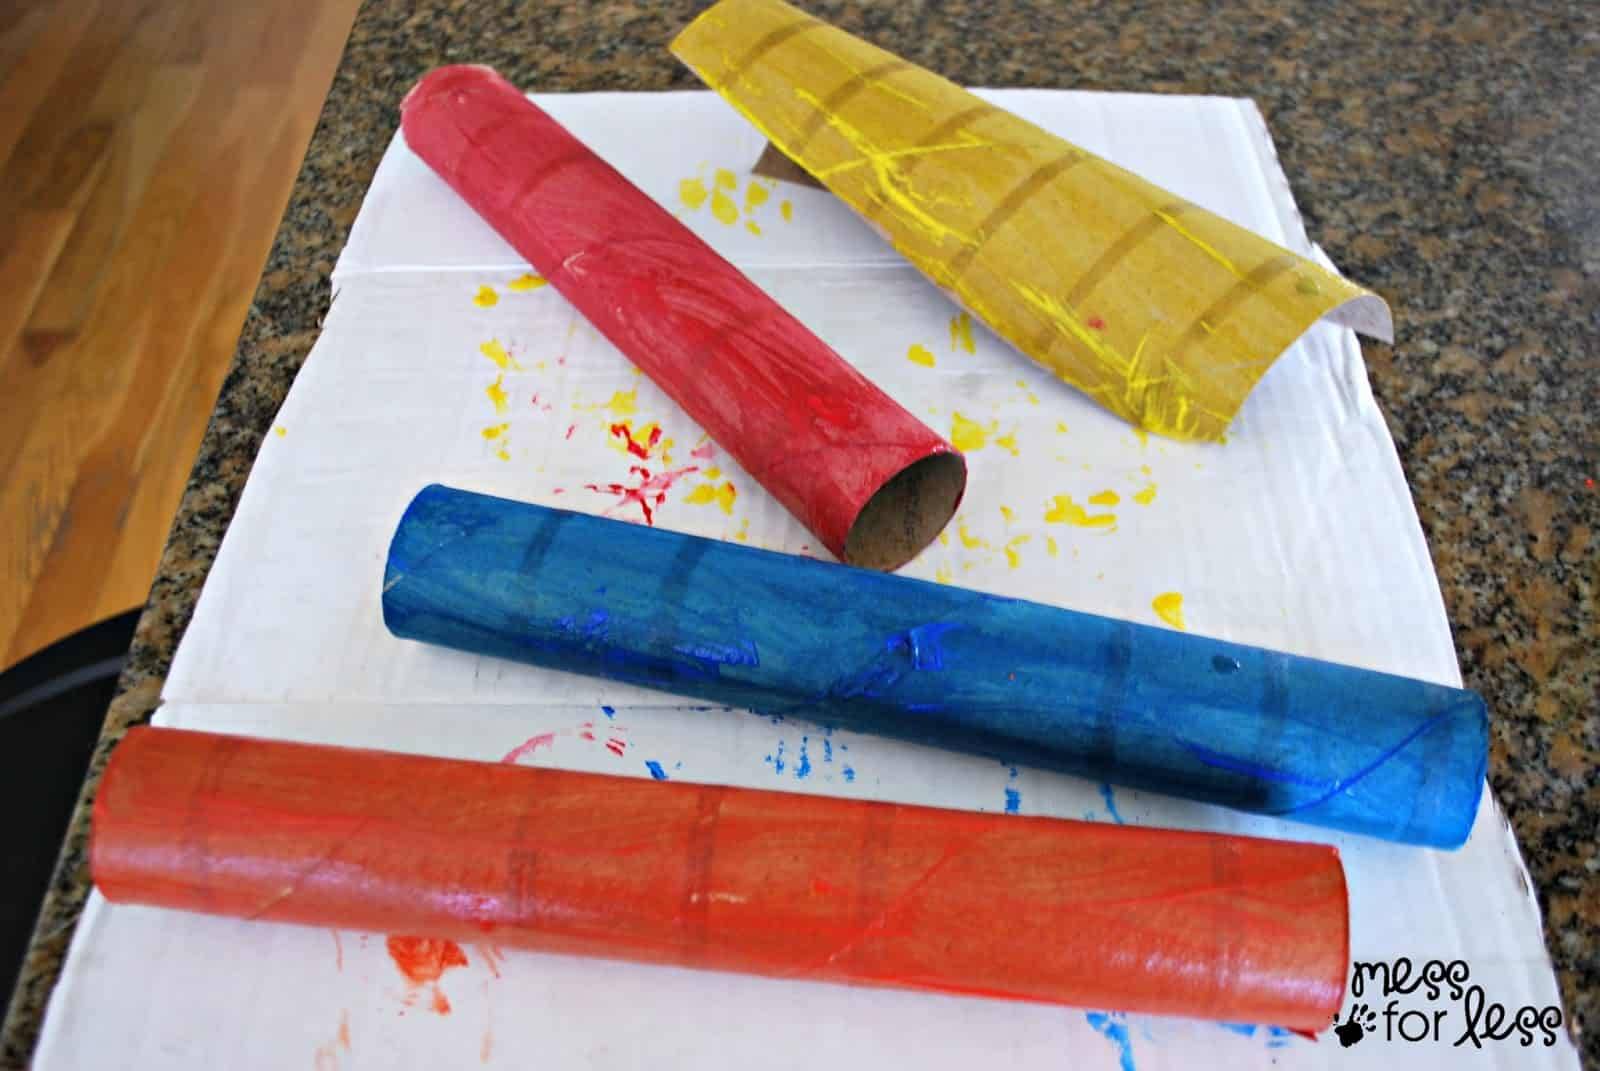 painted paper towel tubes